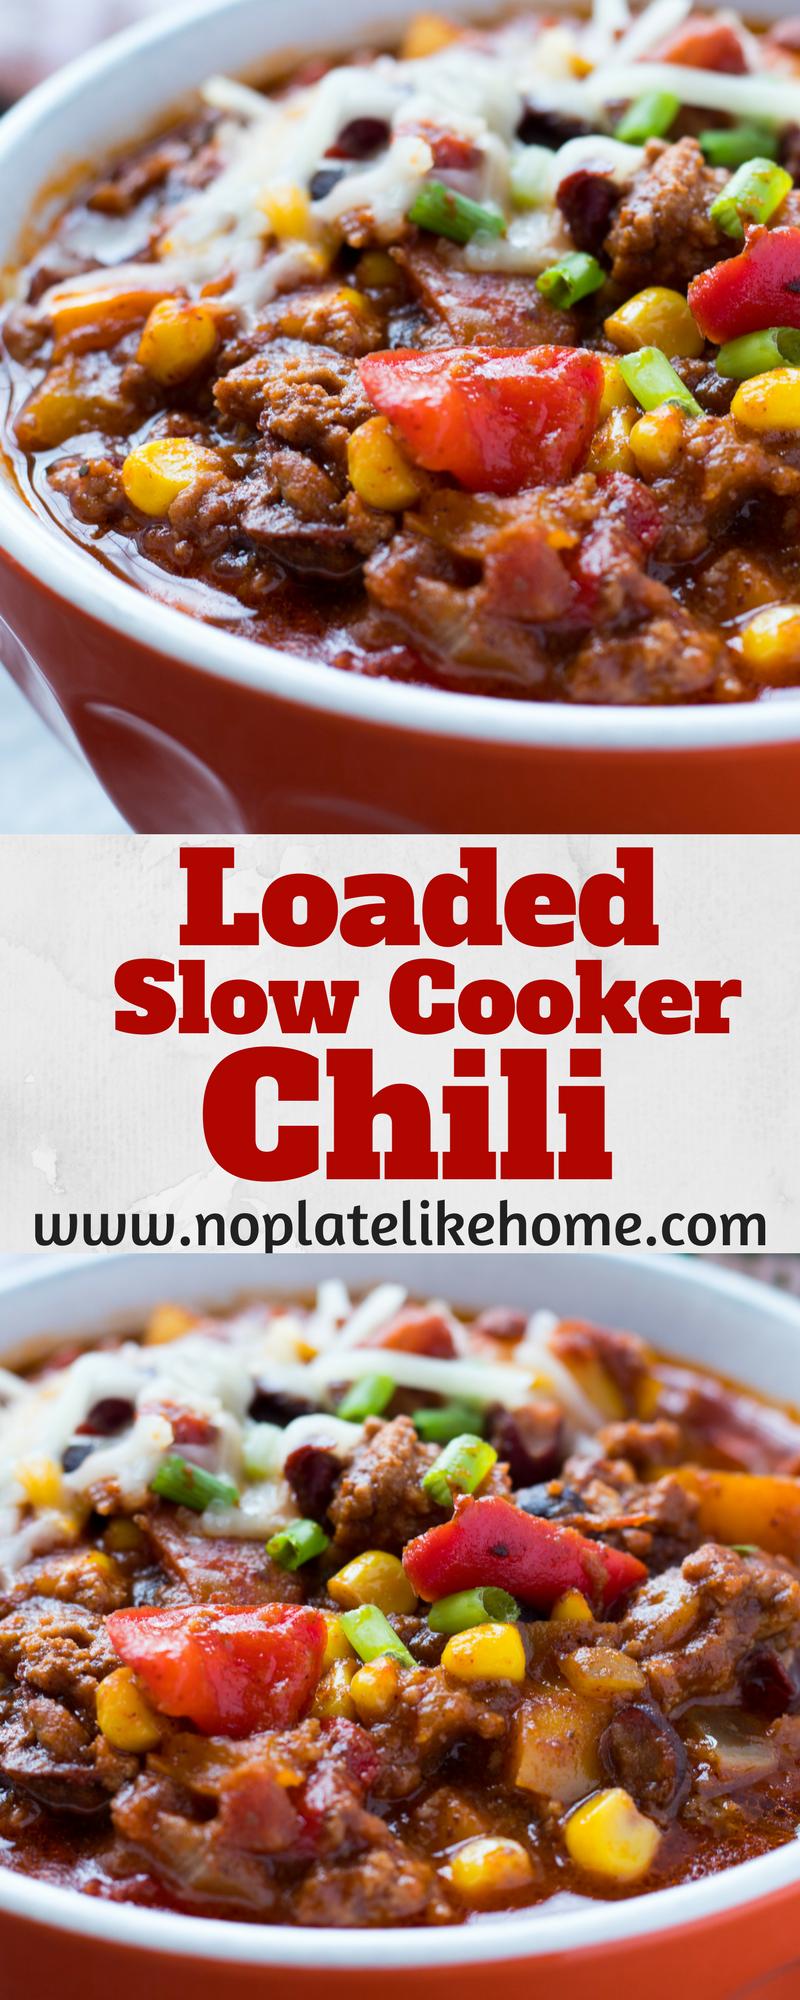 Easy Loaded Easy Slow Cooker Santa Fe Chili Chilirecipe